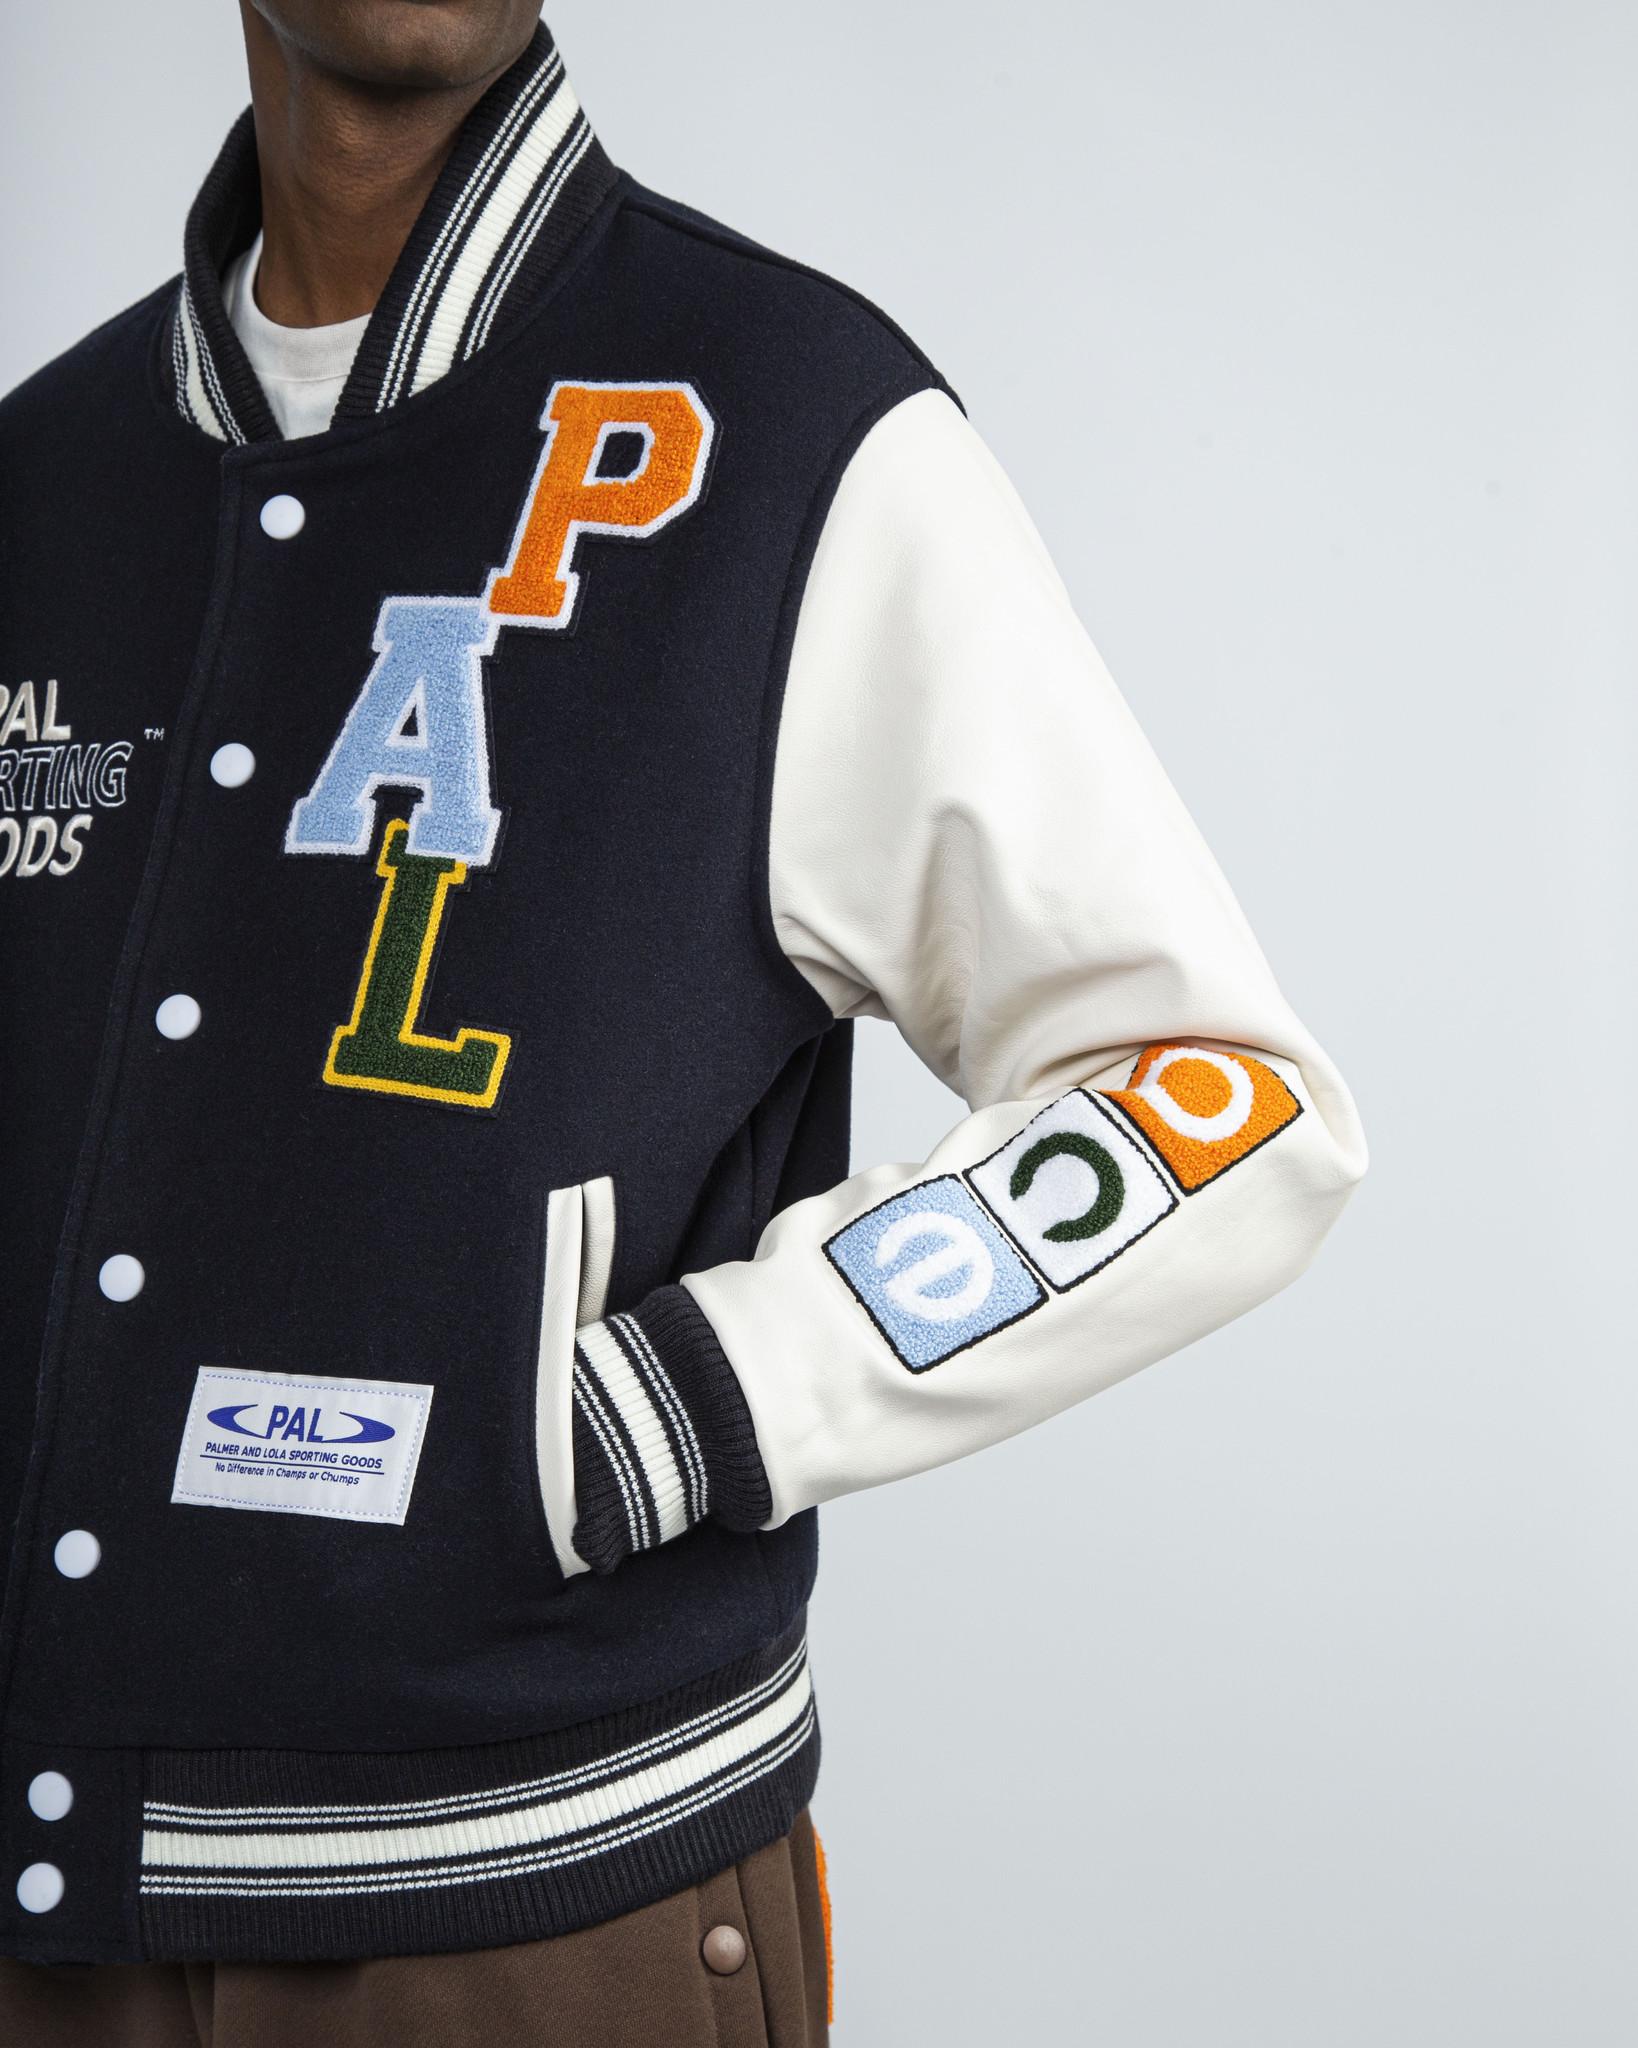 PAL Championship varsity jacket